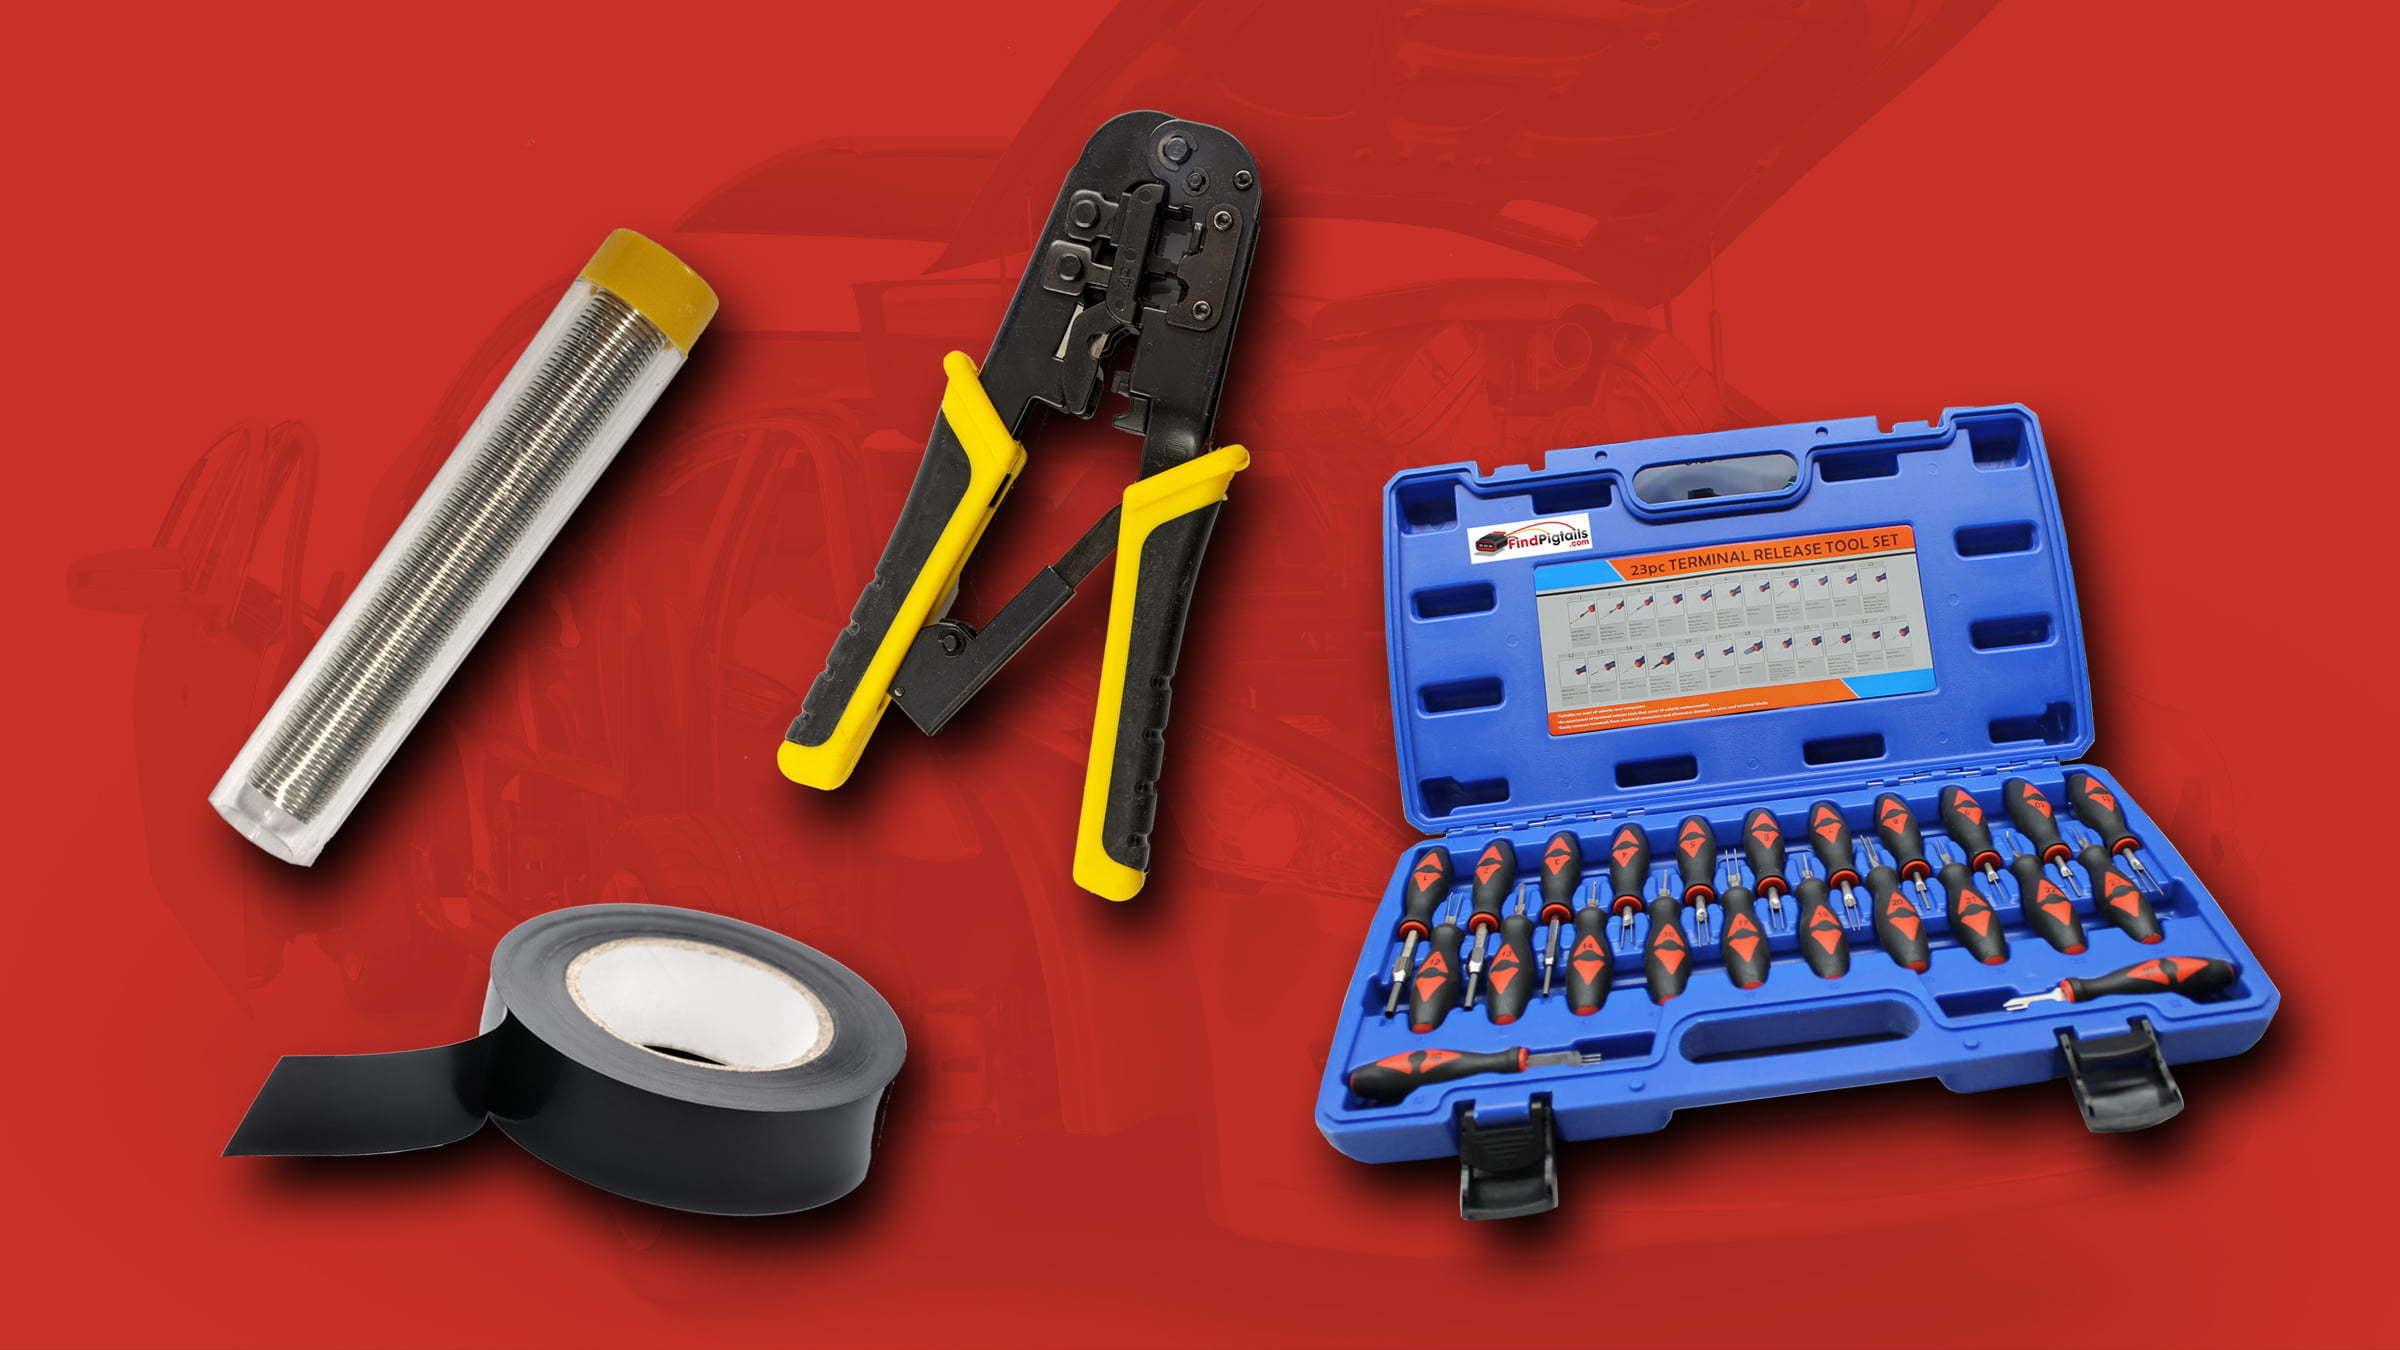 Connector-Repair-Accessories-03-hero